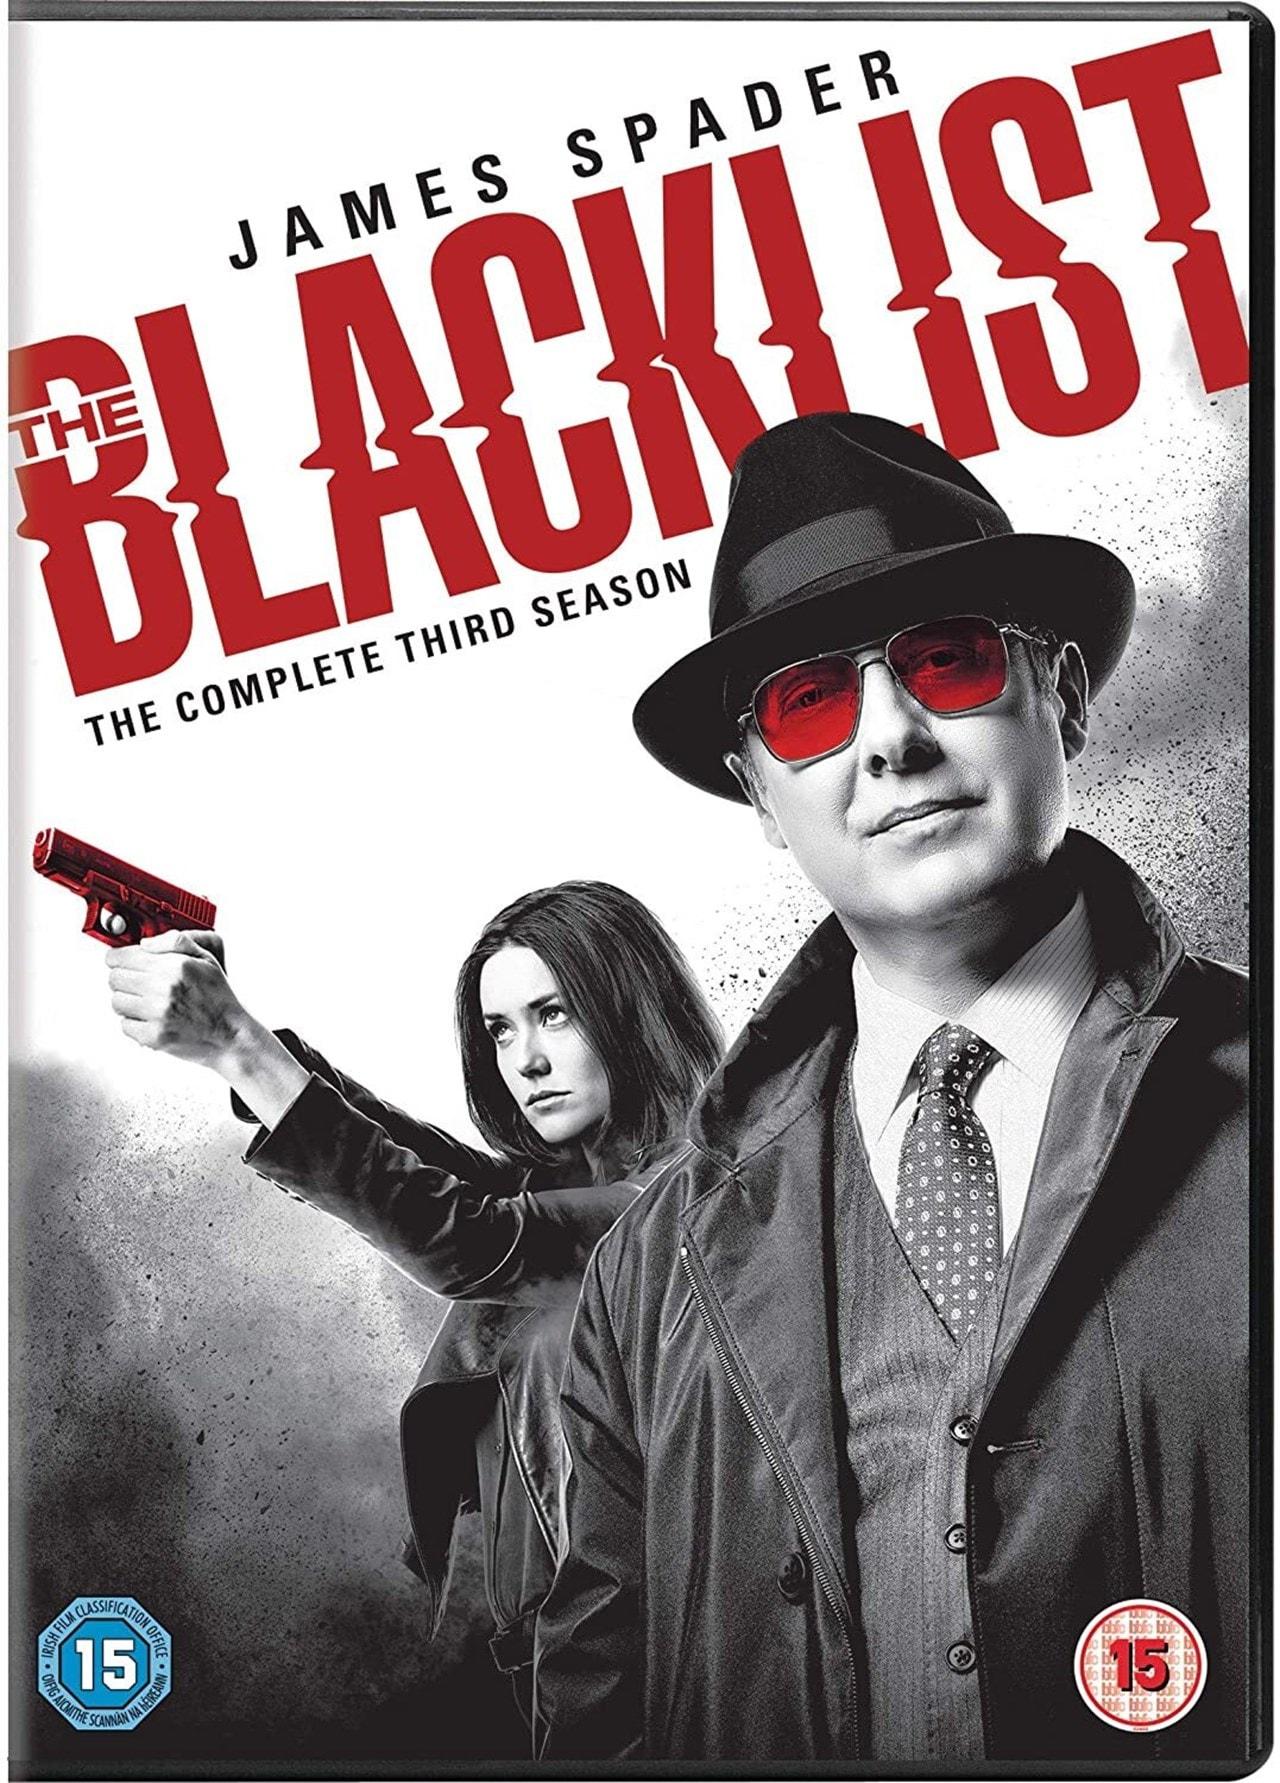 The Blacklist: The Complete Third Season - 1